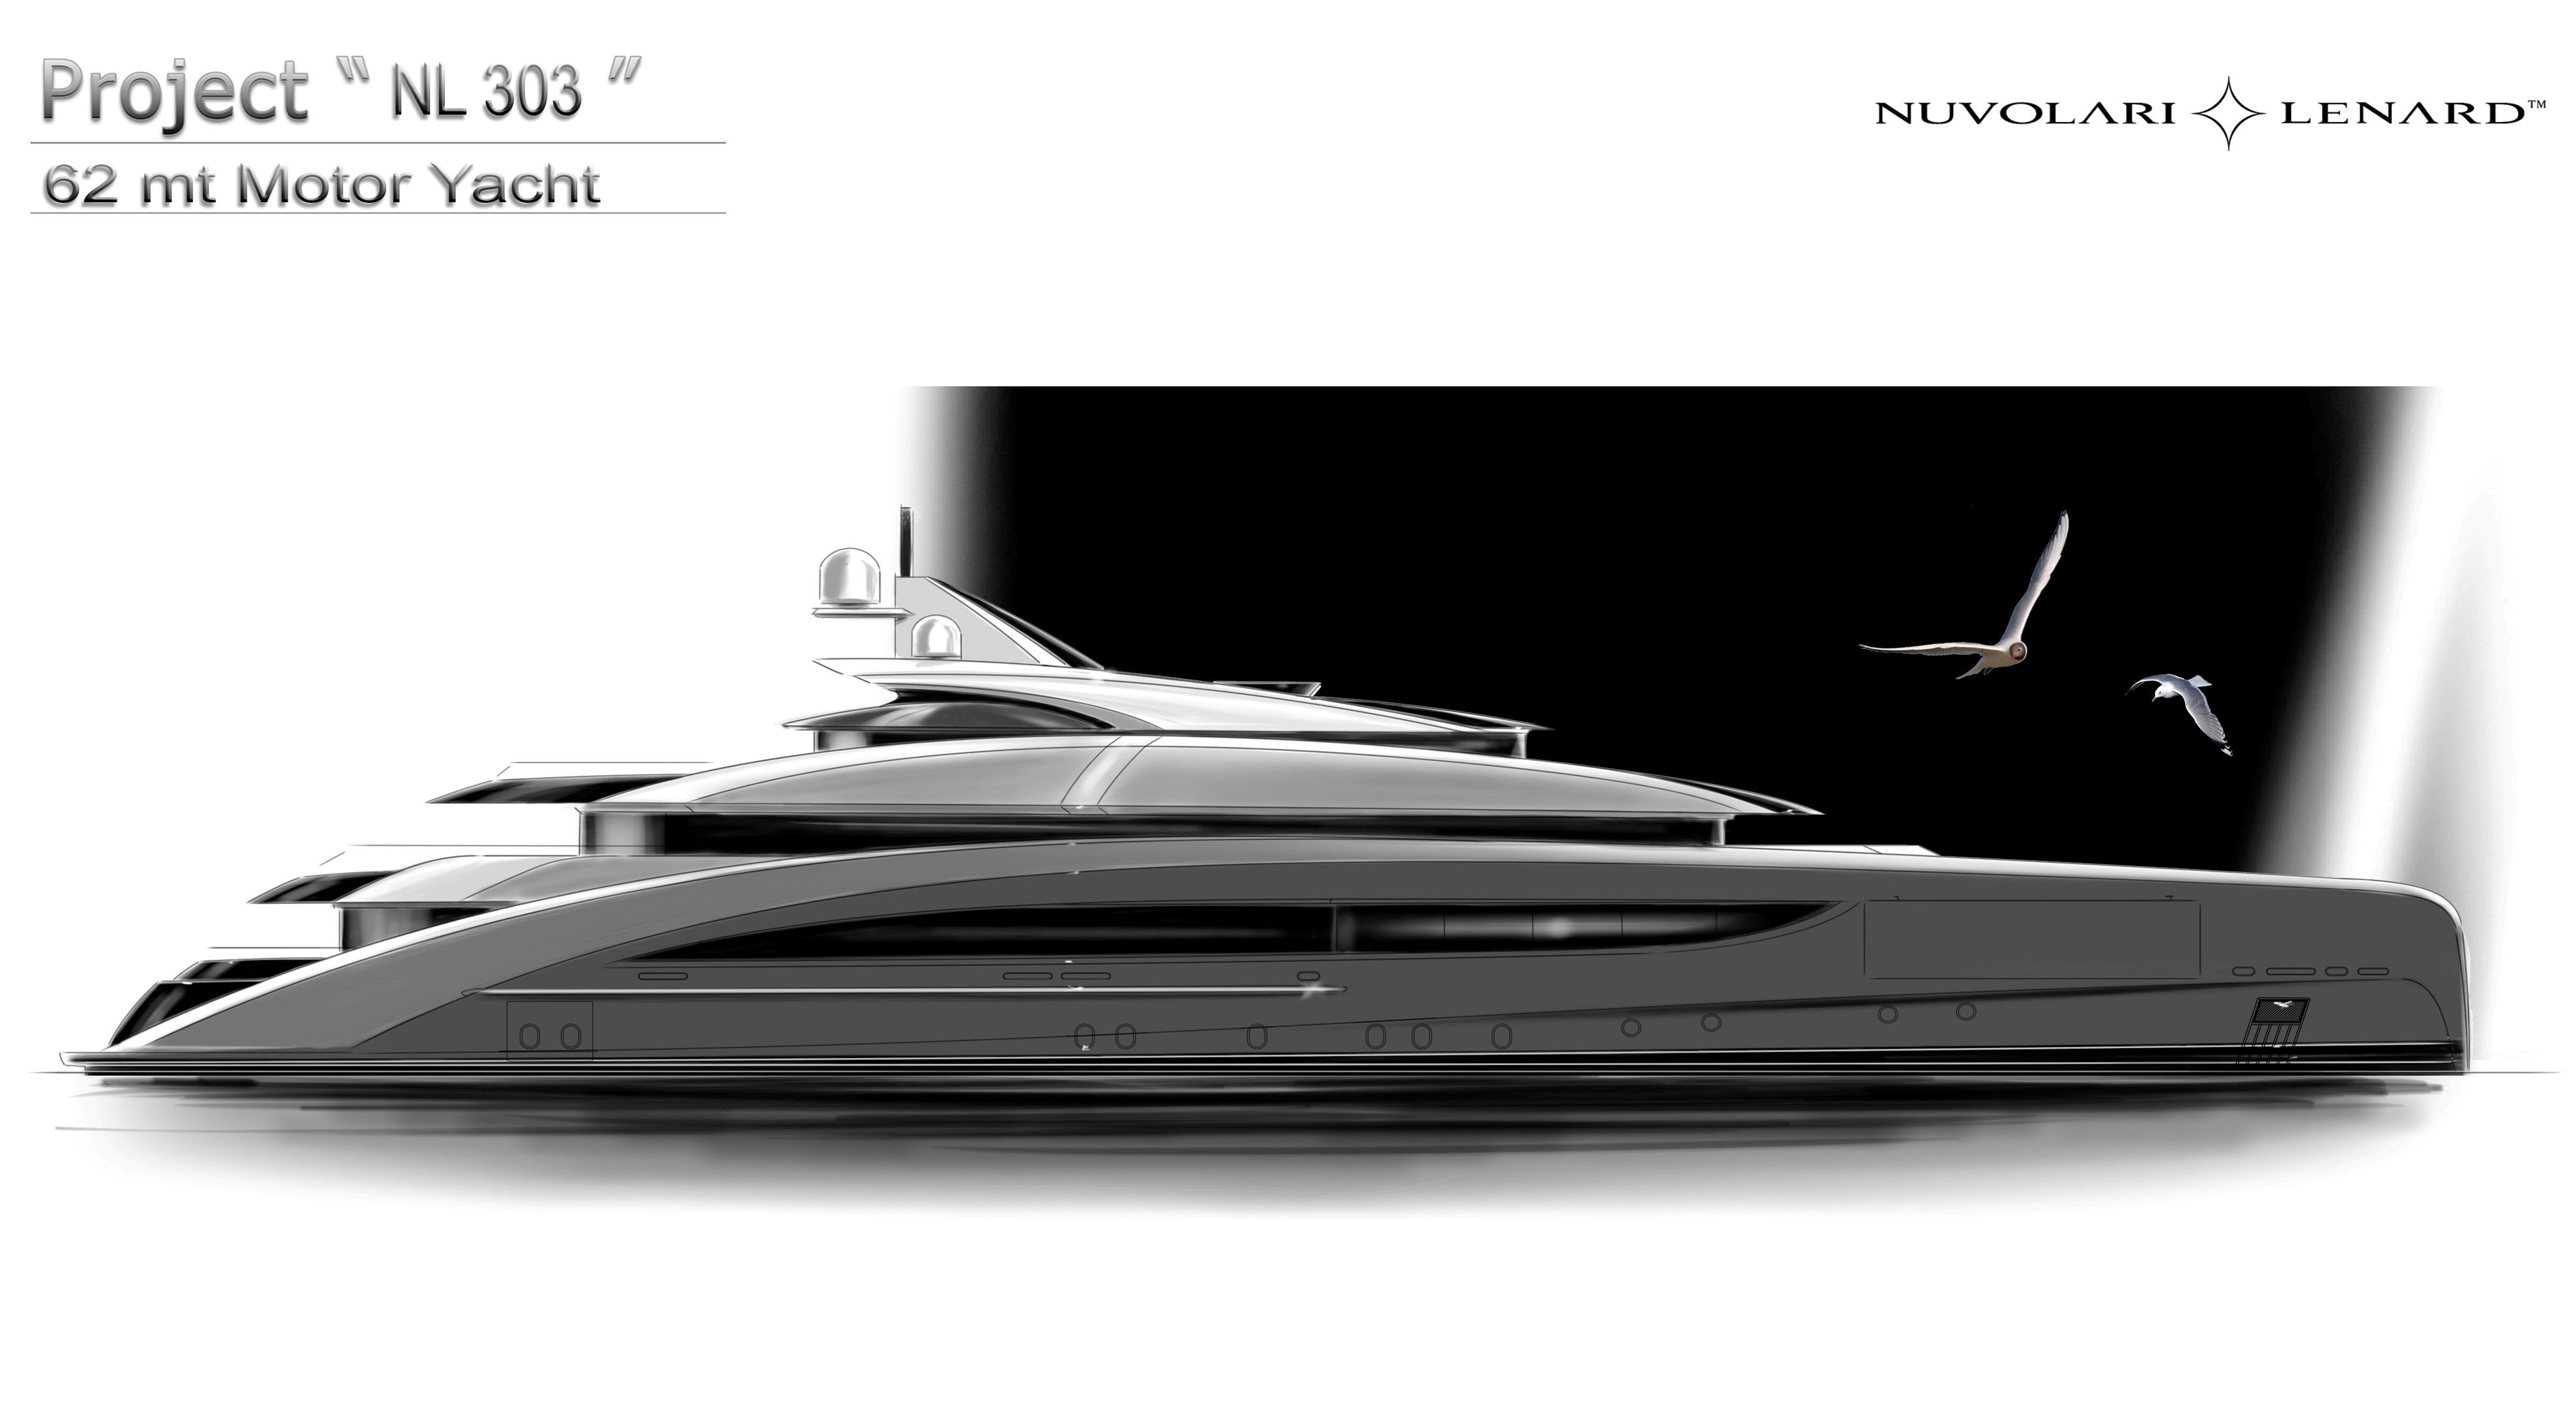 CRN Announces 62 M Designed By Nuvolari Lenard Yellow